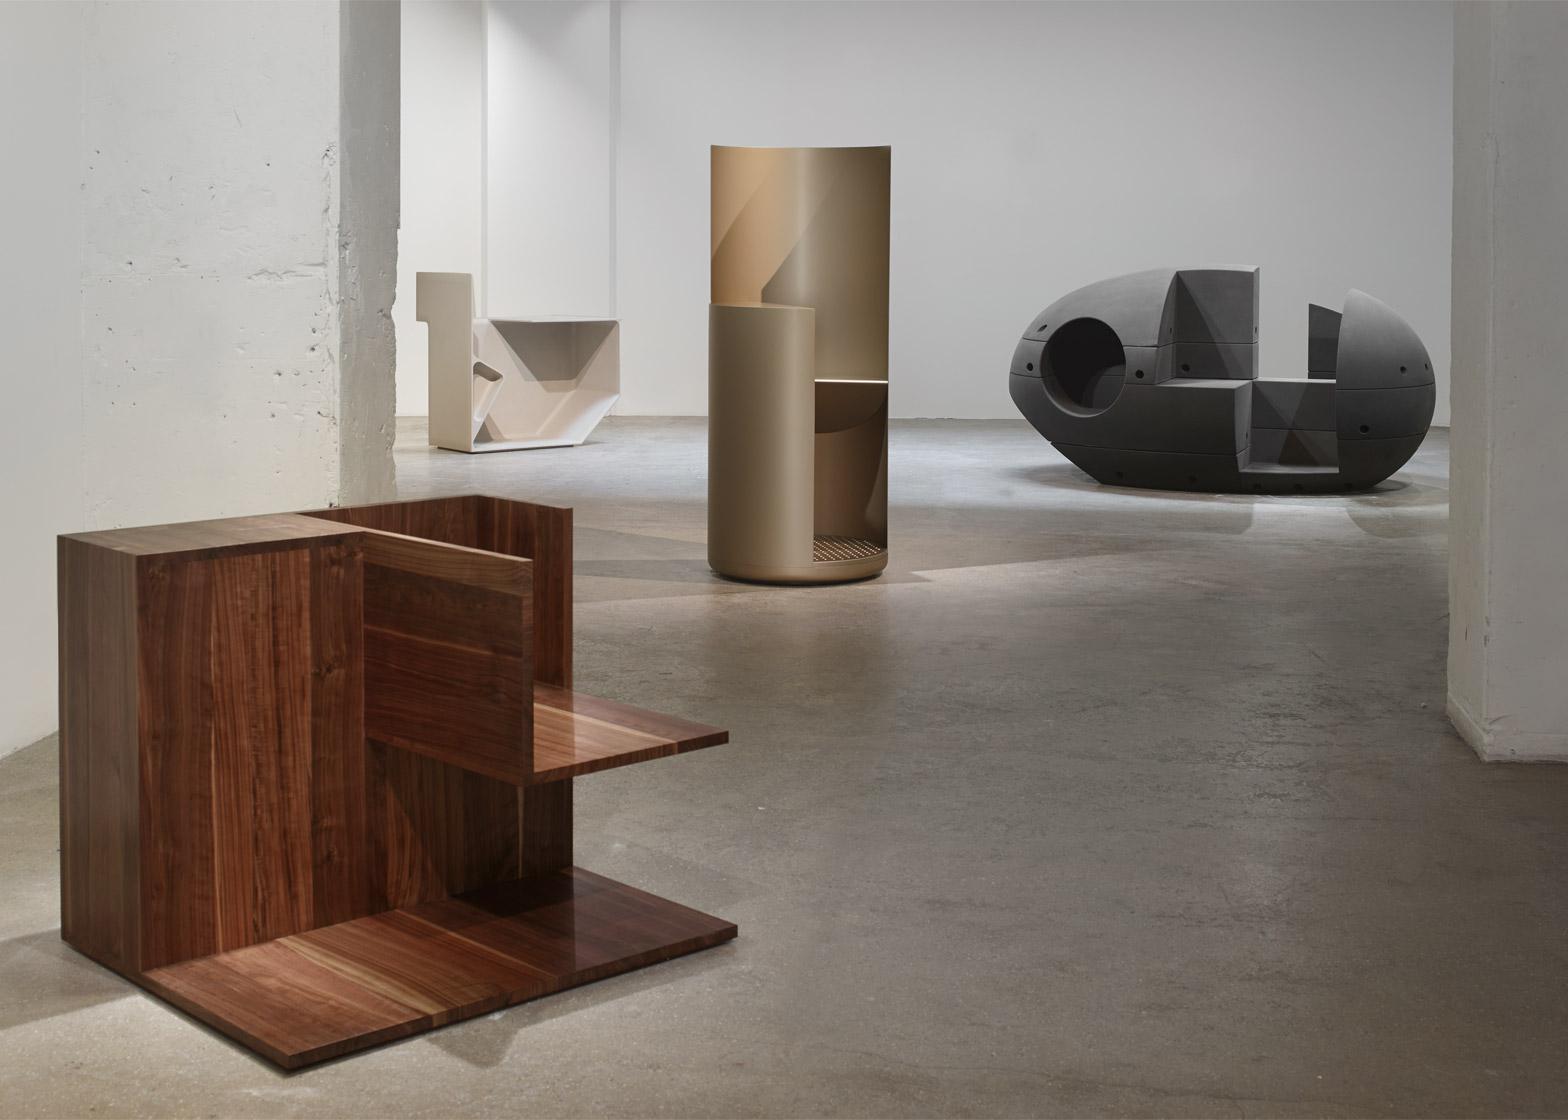 Hieronymous by Konstantin Grcic at Galerie kreo